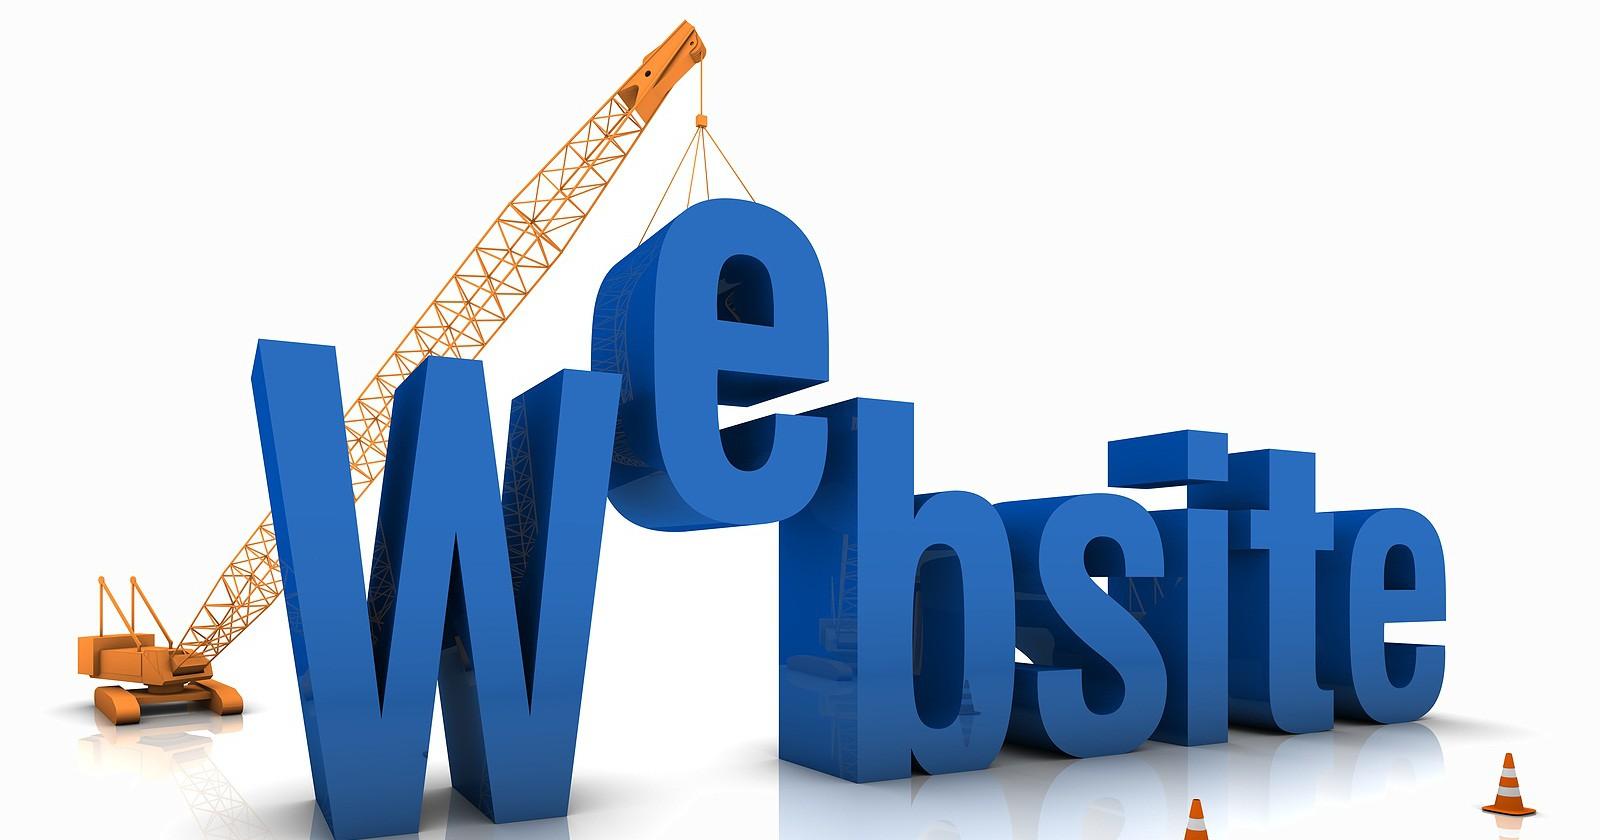 website-edit-21-e1406428627306